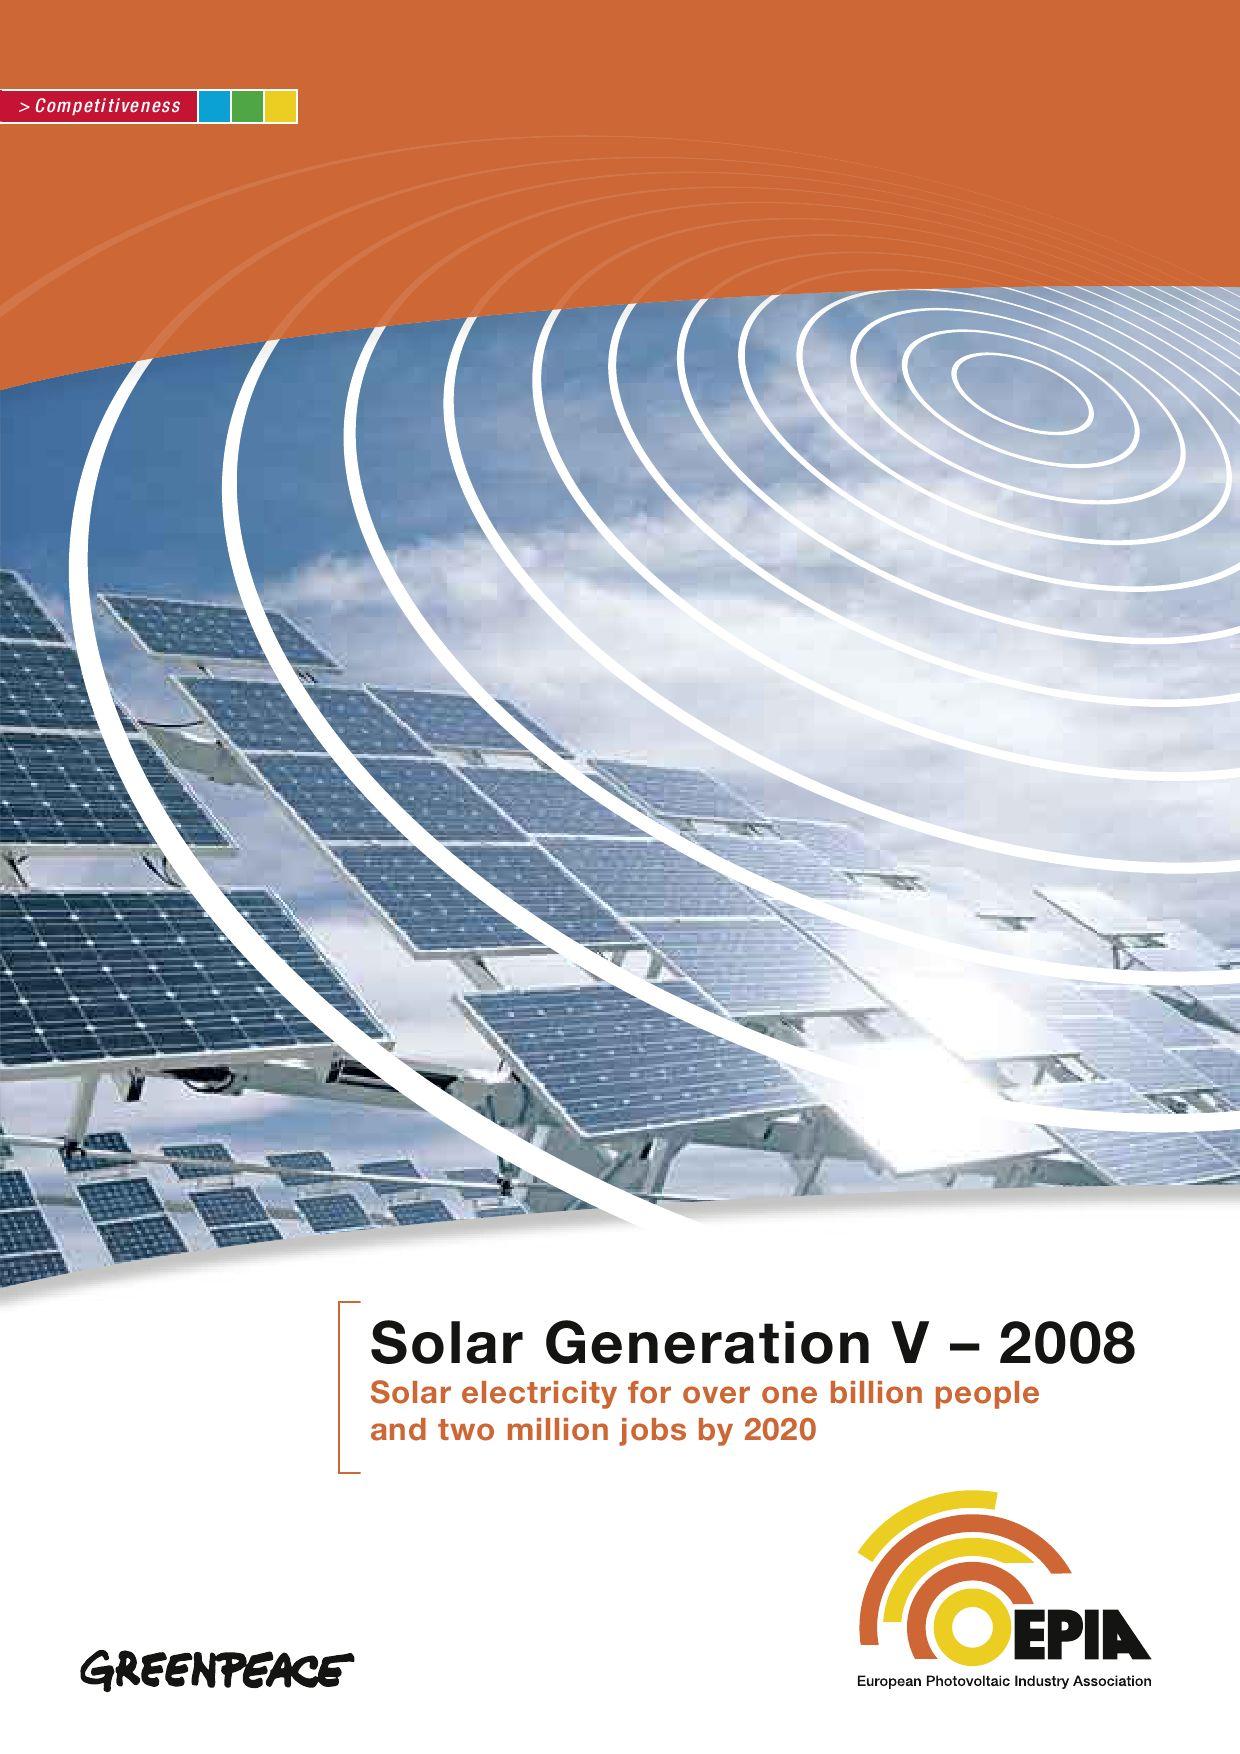 ESTIF - European Solar Thermal Industry Federation Epia european photovoltaic industry association